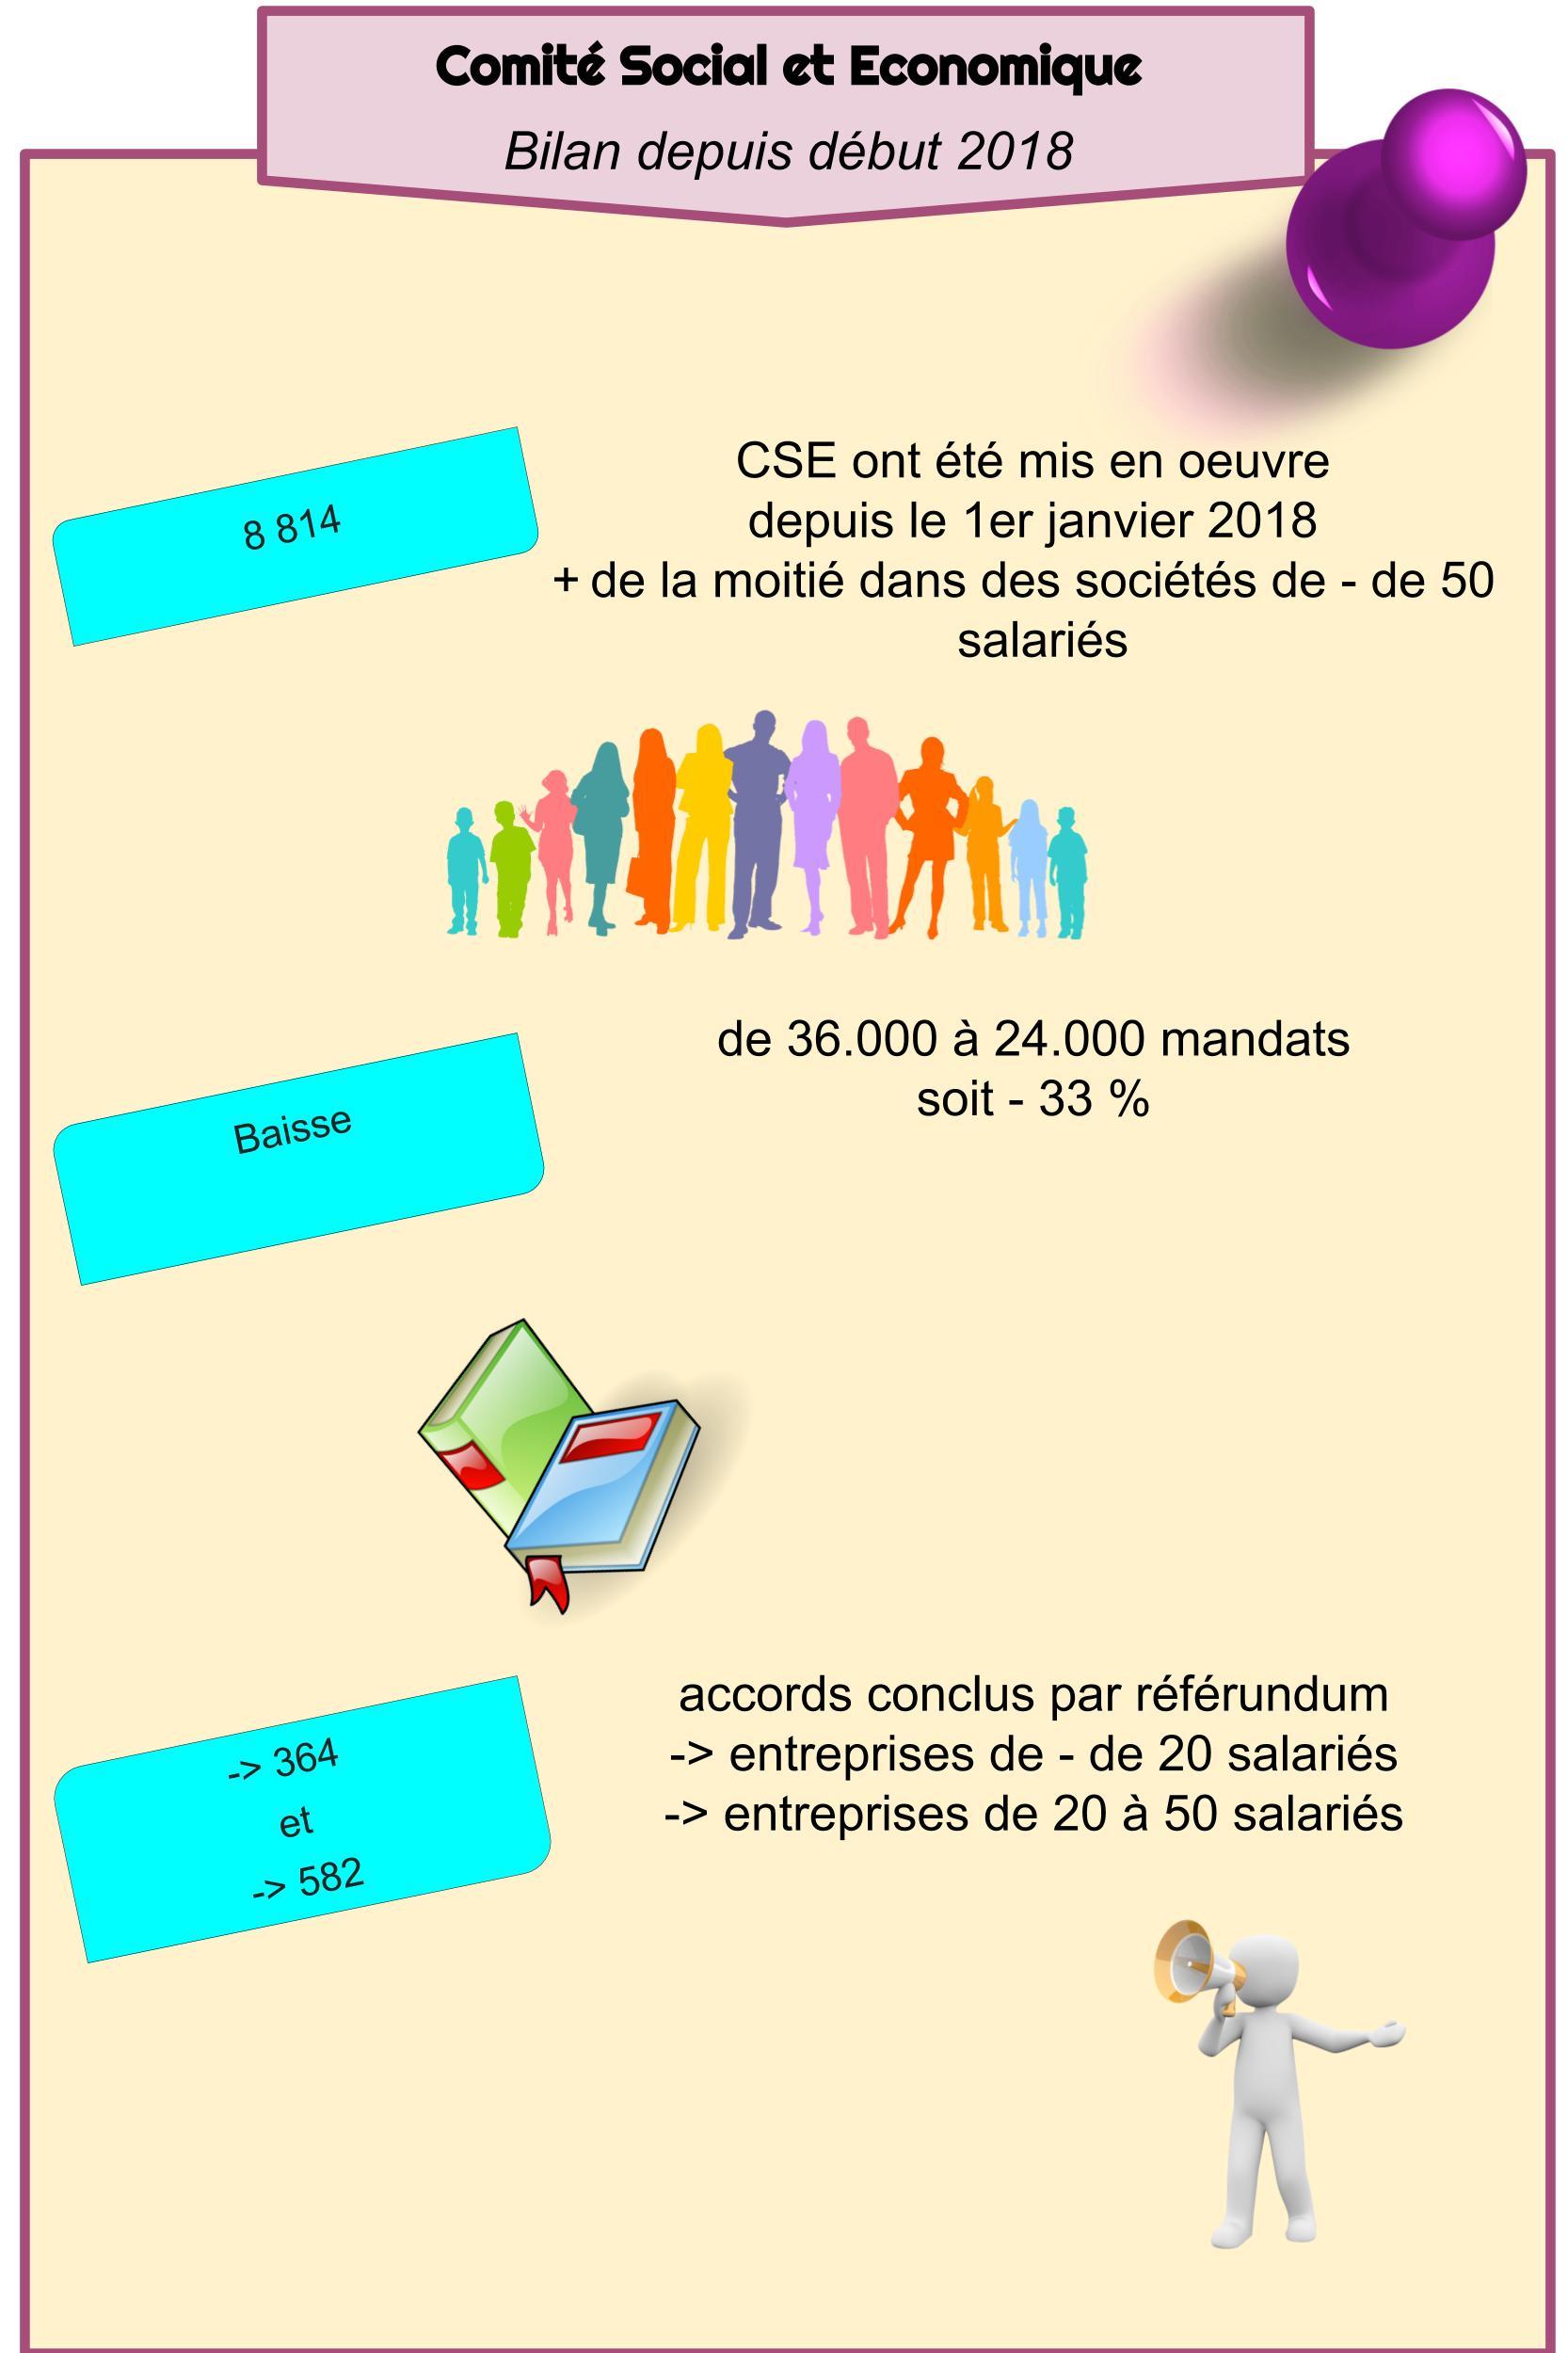 CSE - Bilan depuis début 2018